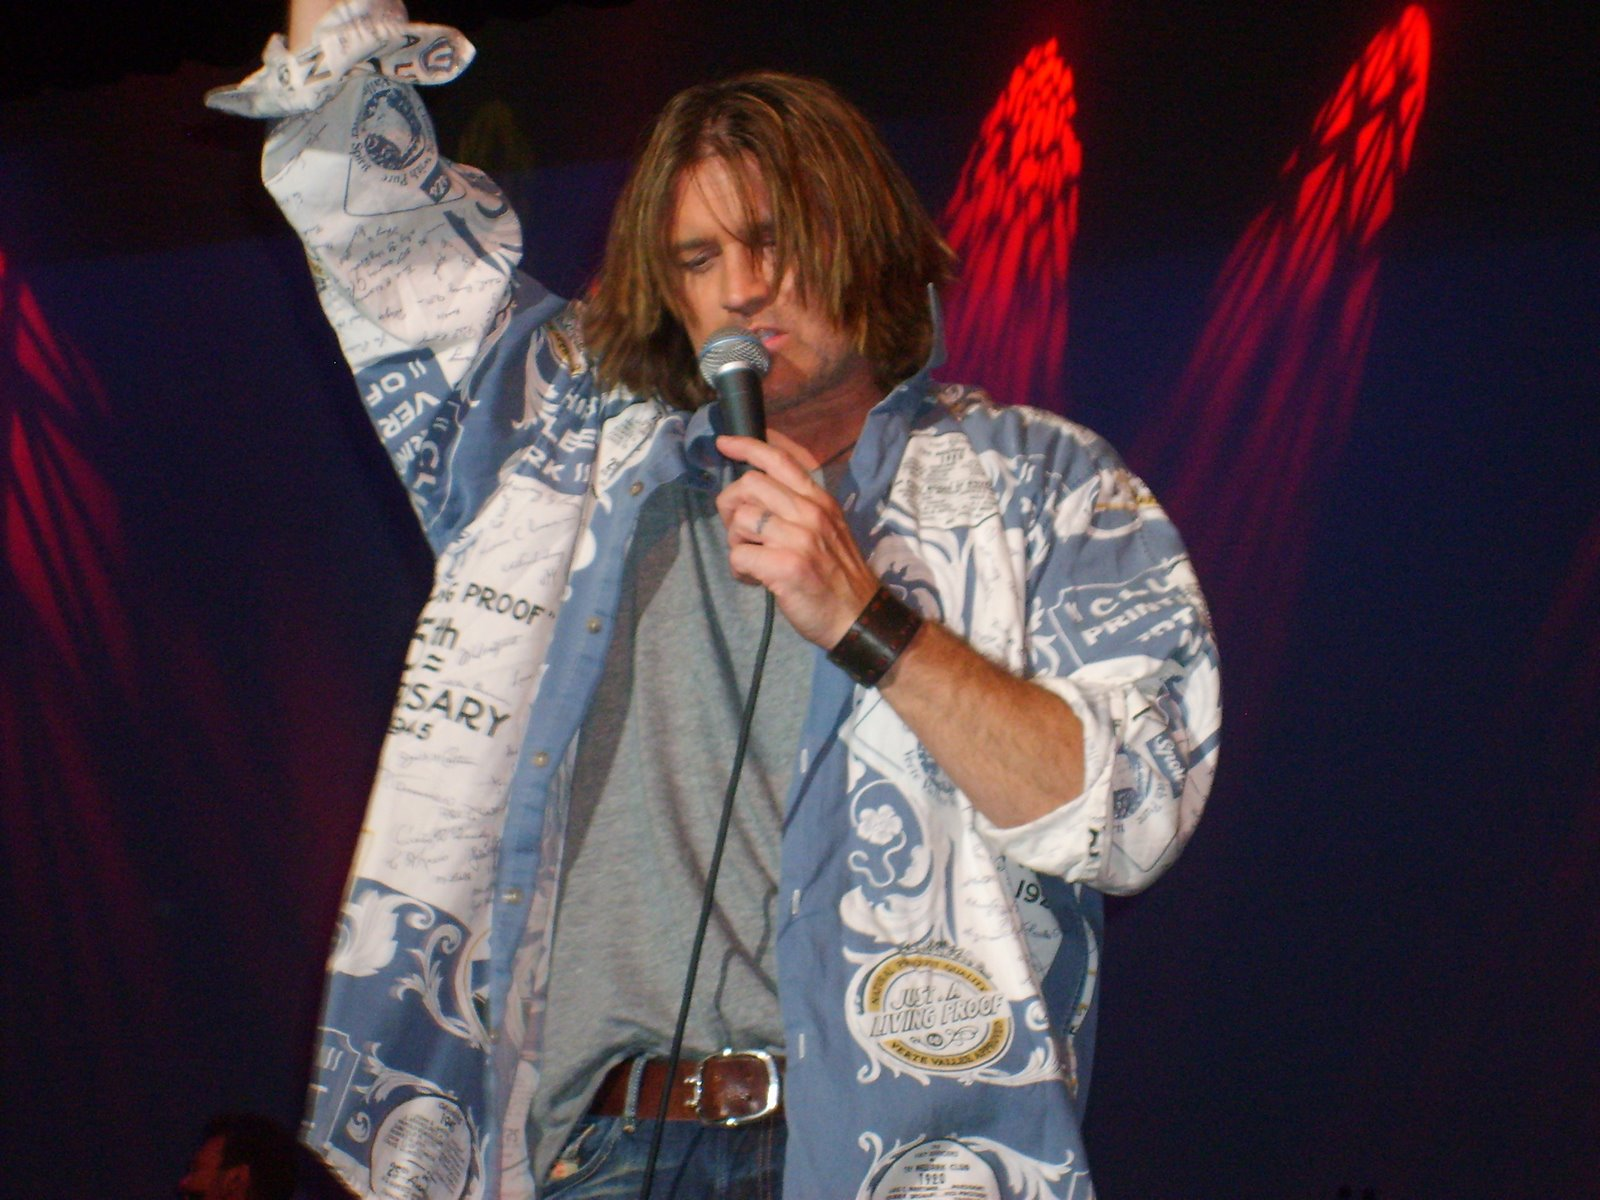 Butterfly fly away miley cyrus lyrics karaoke